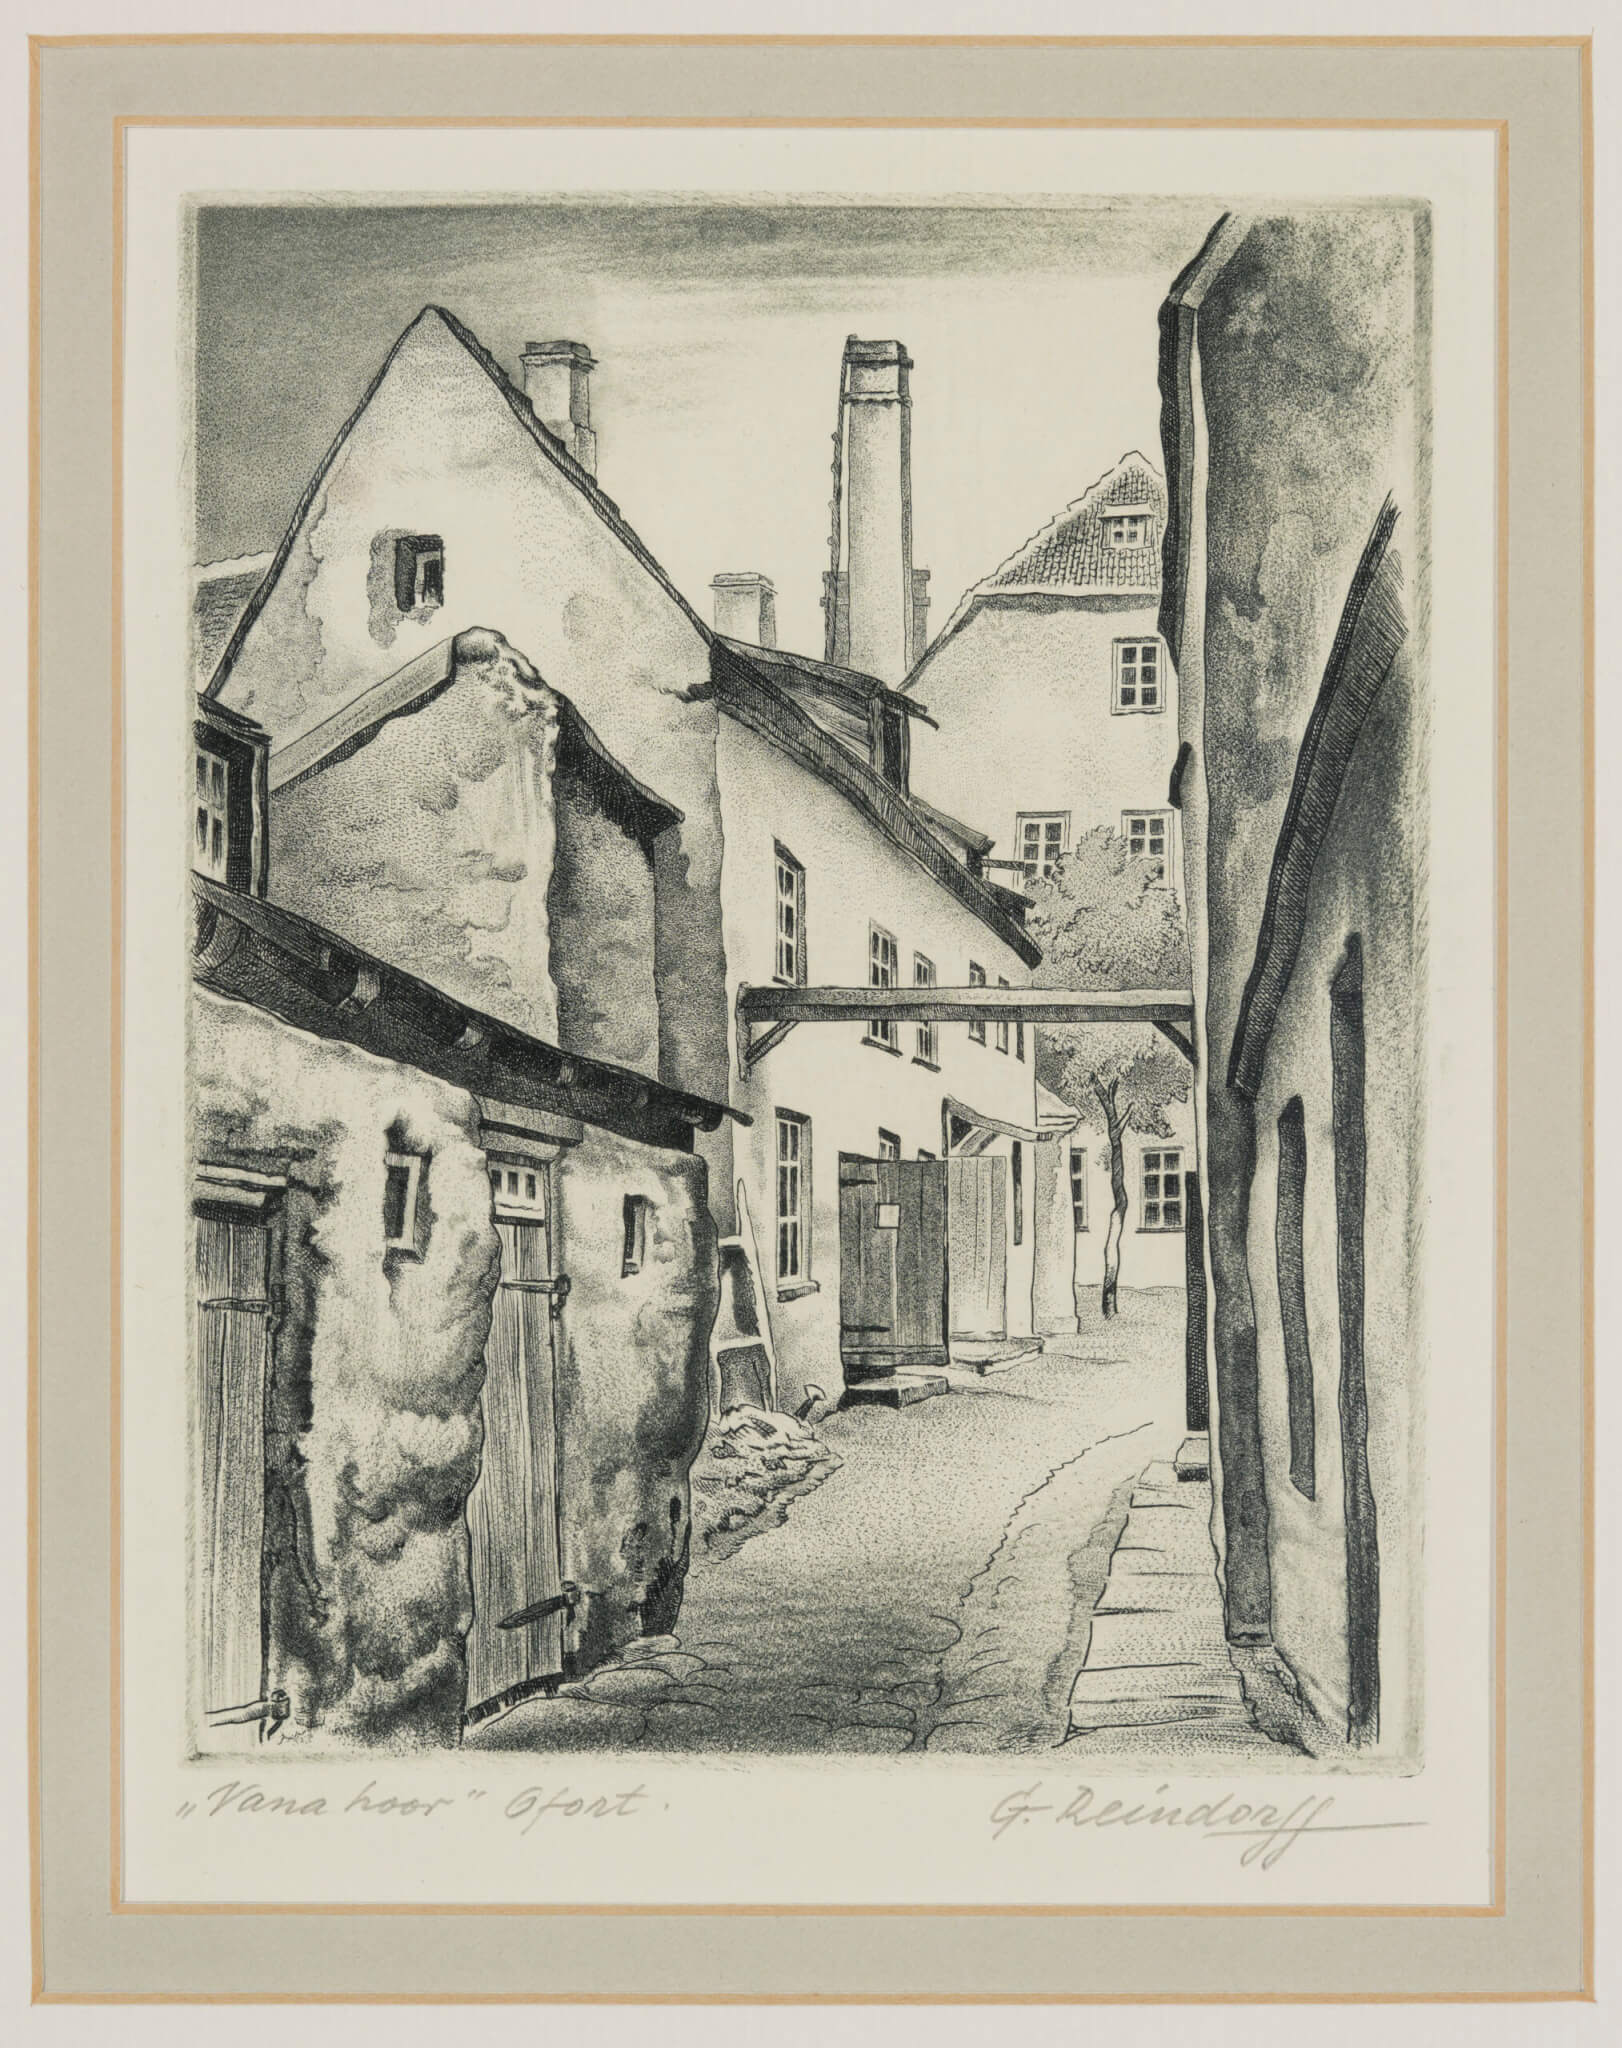 Günter-Reindorff-Vana-hoov-Allee-kunstioksjon